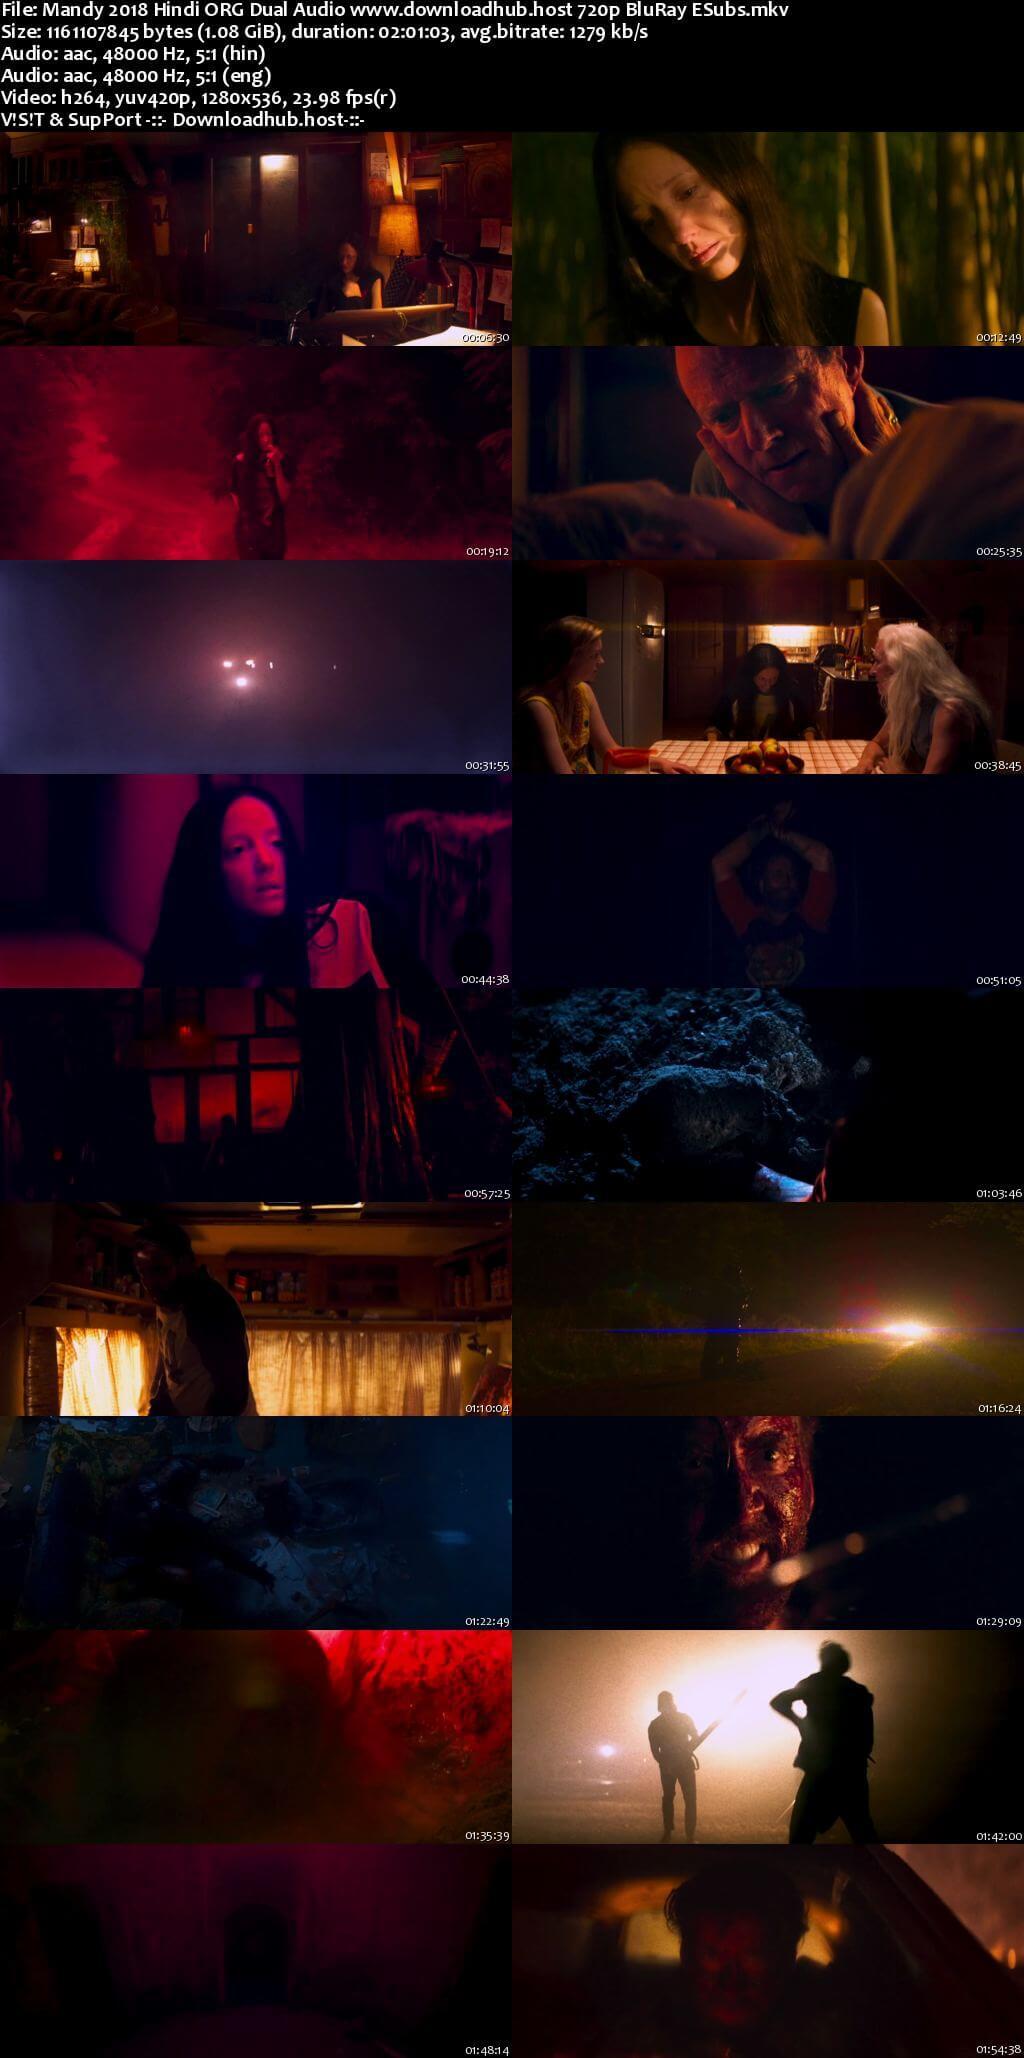 Mandy 2018 Hindi ORG Dual Audio 720p BluRay ESubs